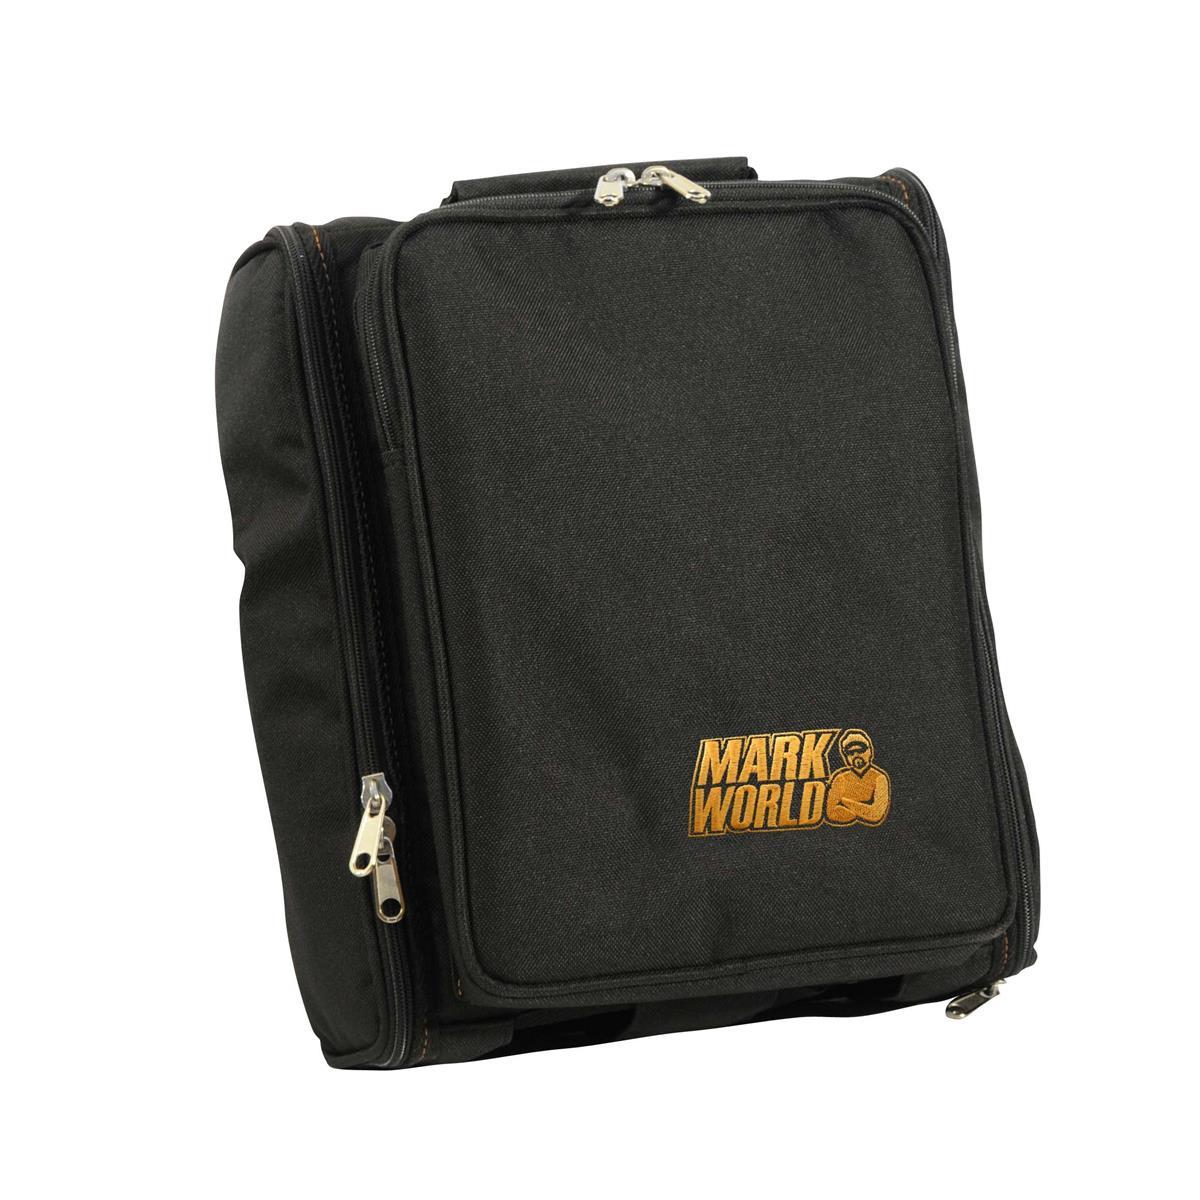 MARKBASS-MARKWORLD-BAG-M-little-mark-series-sku-13921